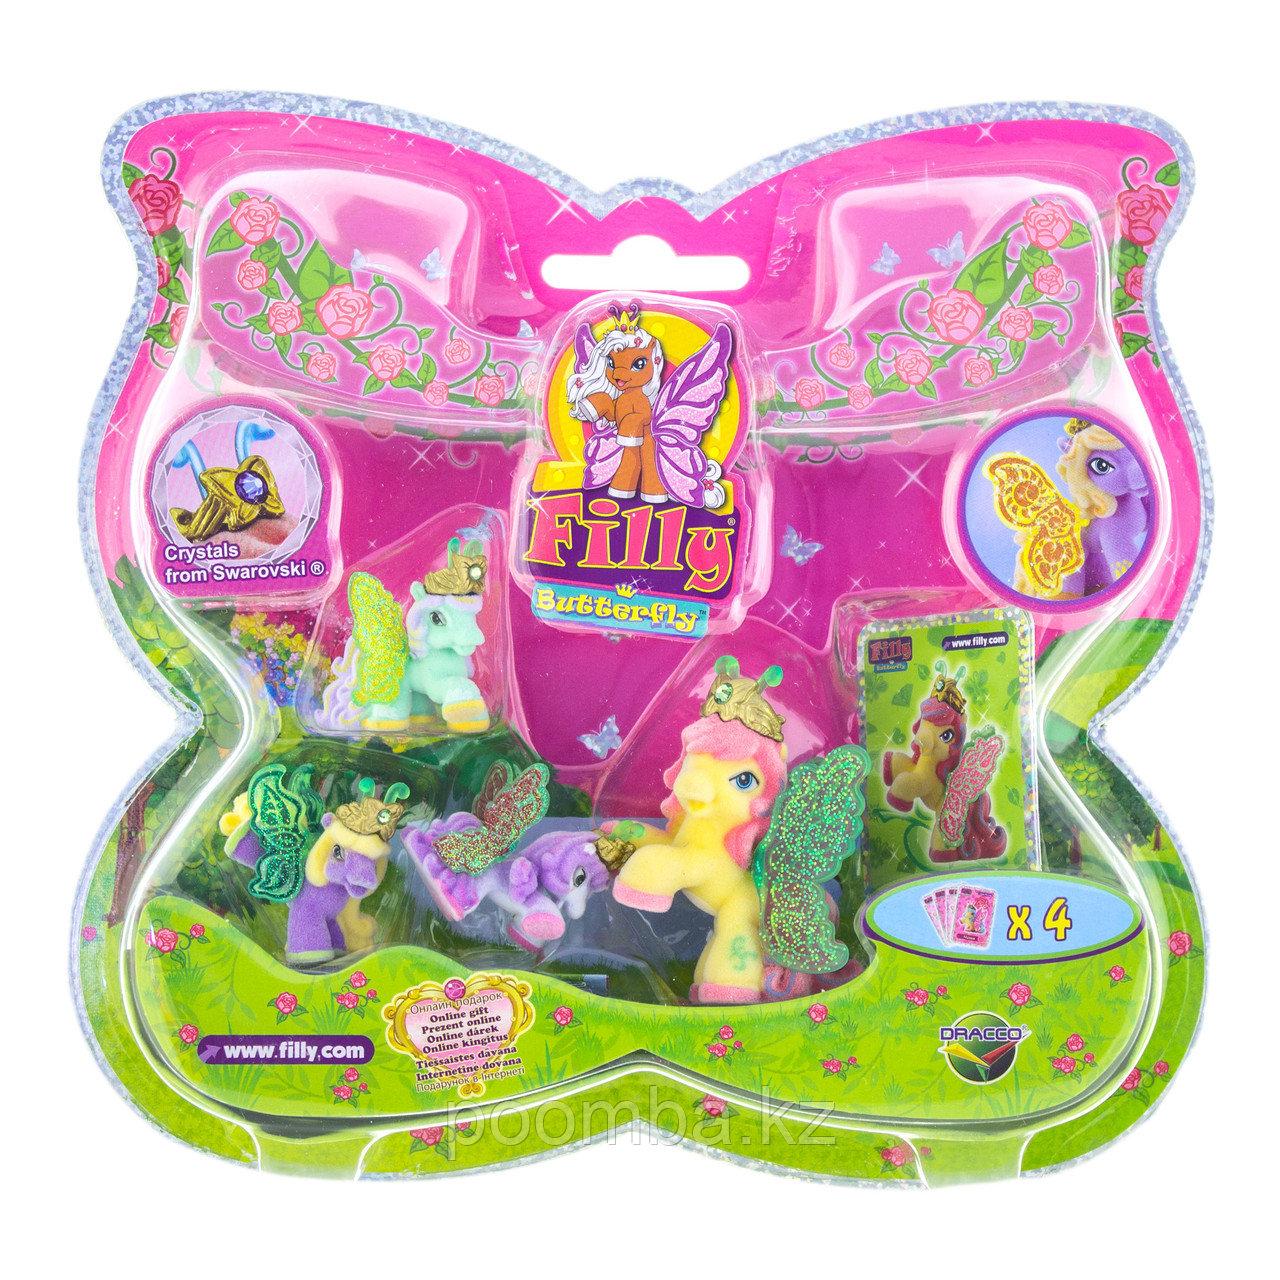 "Большой набор Filly Butterfly Glitter ""Волшебная семья"" - Эмма"